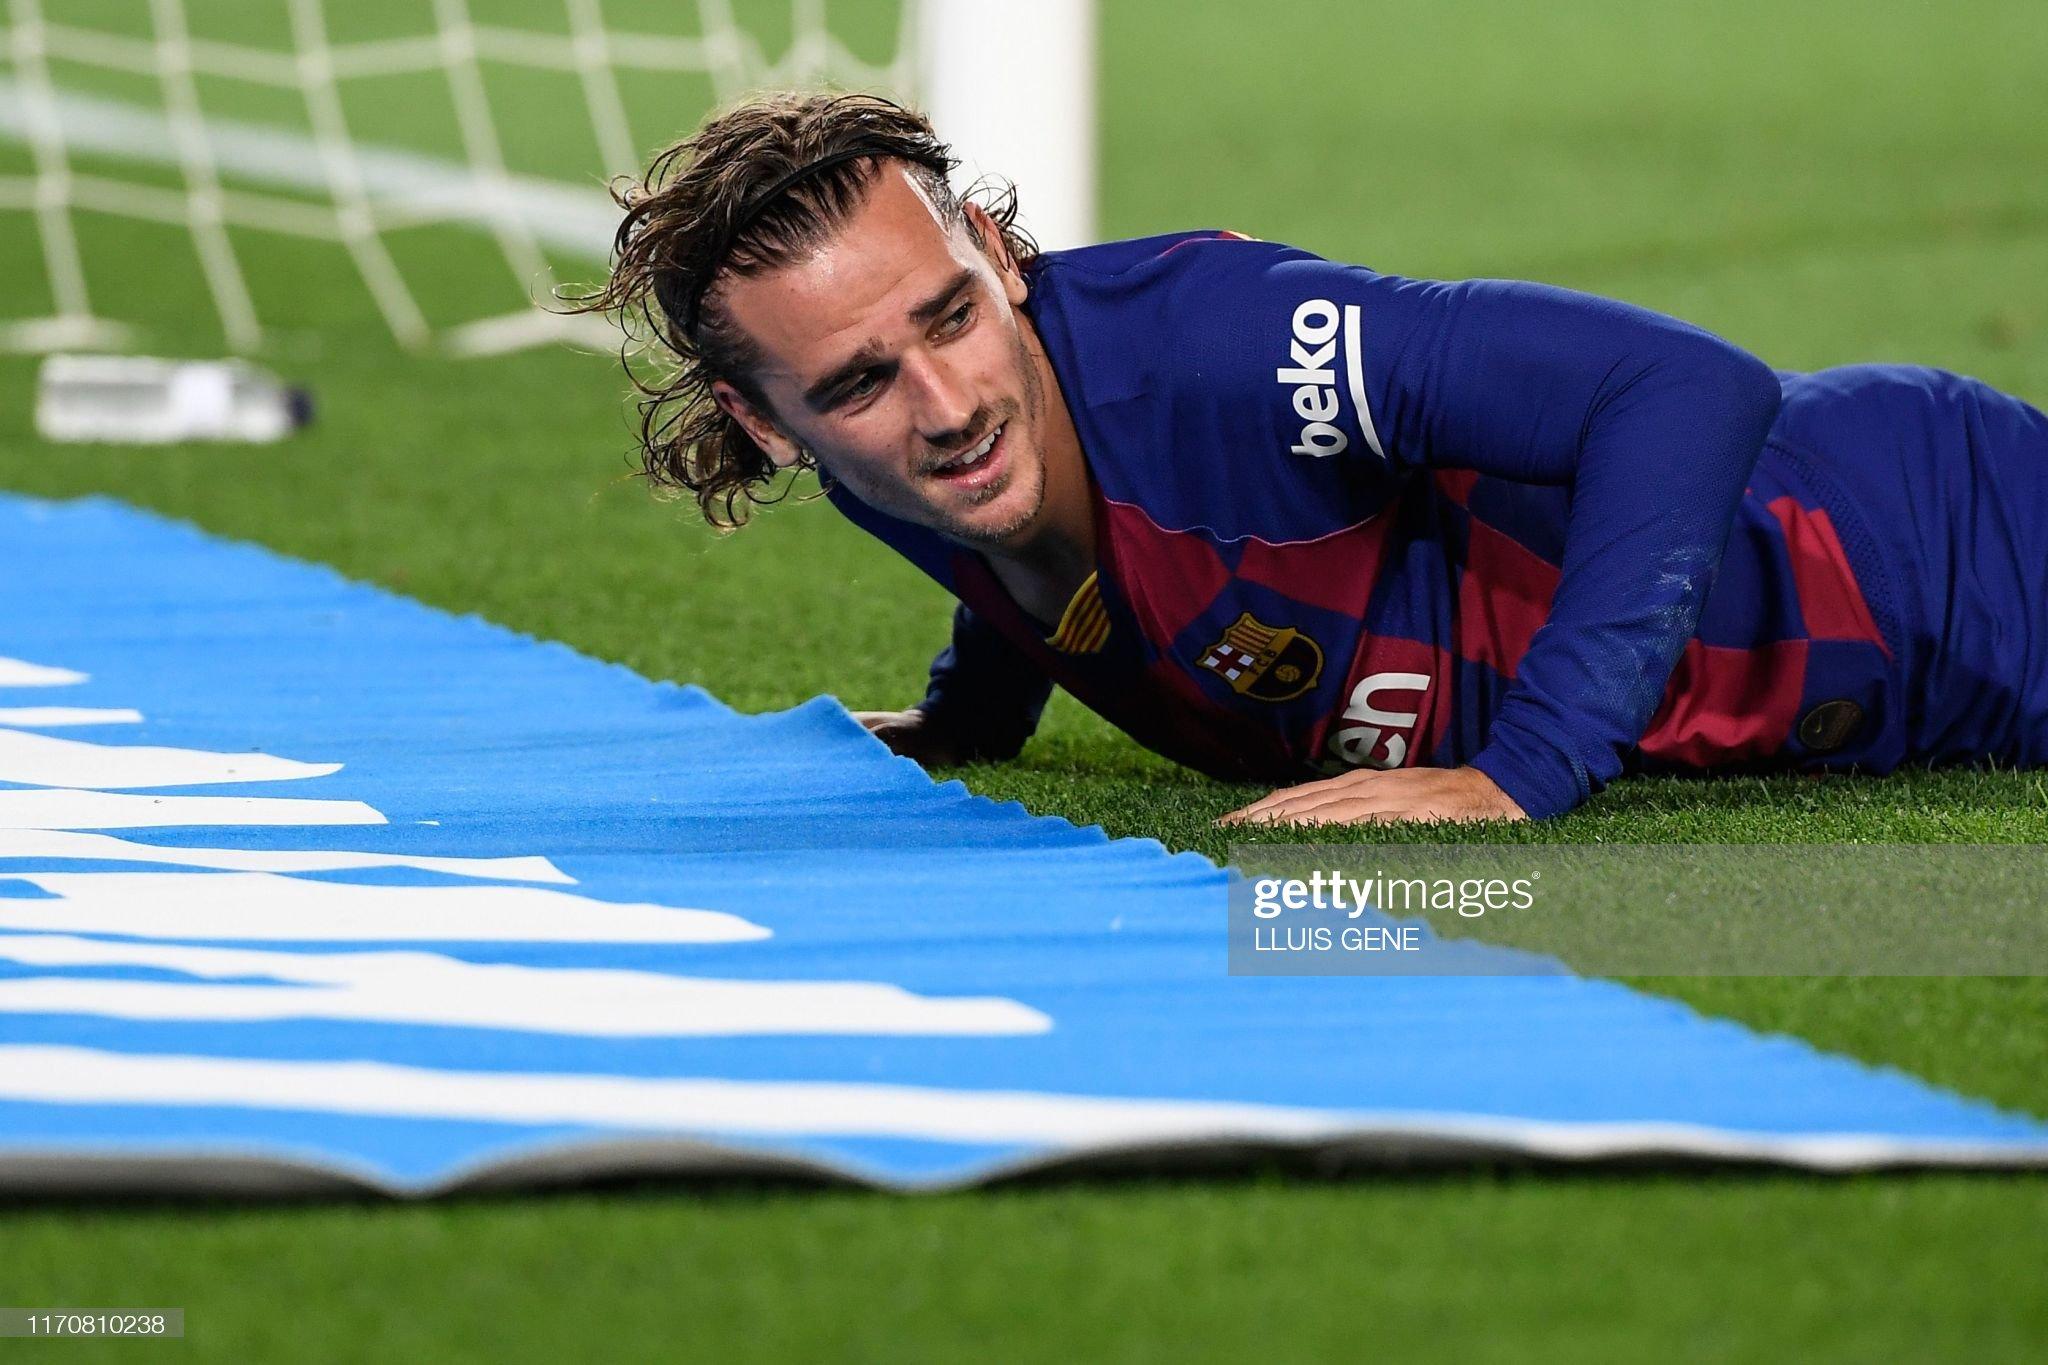 صور مباراة : برشلونة - فياريال 2-1 ( 24-09-2019 )  Barcelonas-french-forward-antoine-griezmann-reacts-after-missing-a-picture-id1170810238?s=2048x2048